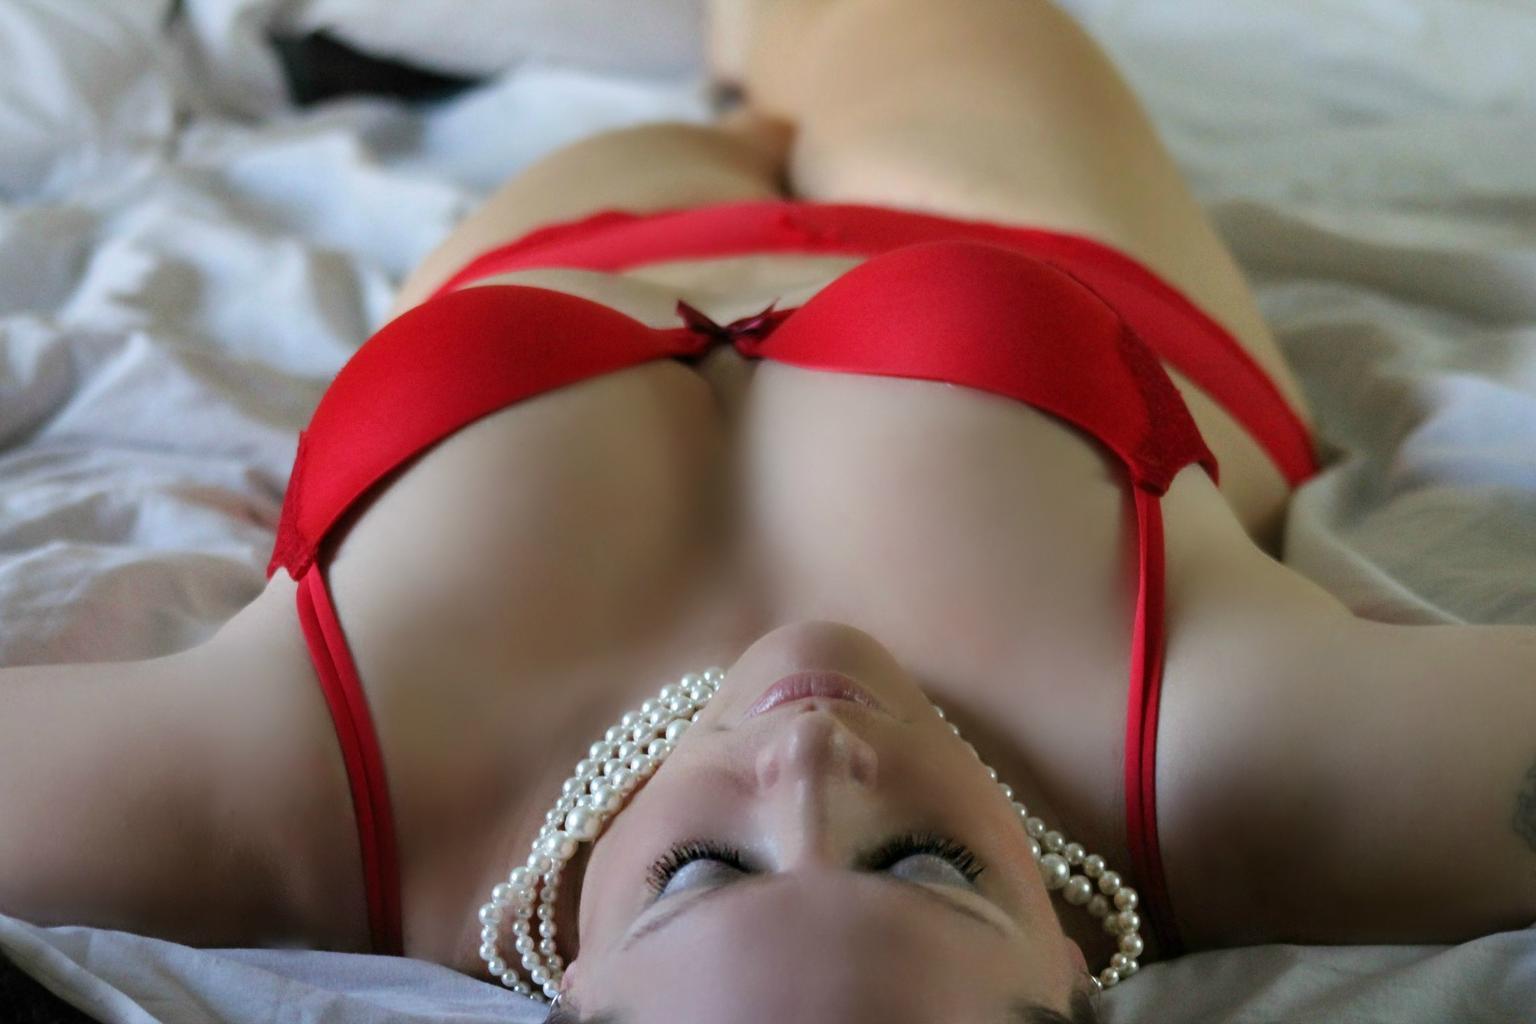 erotické, sexi žena